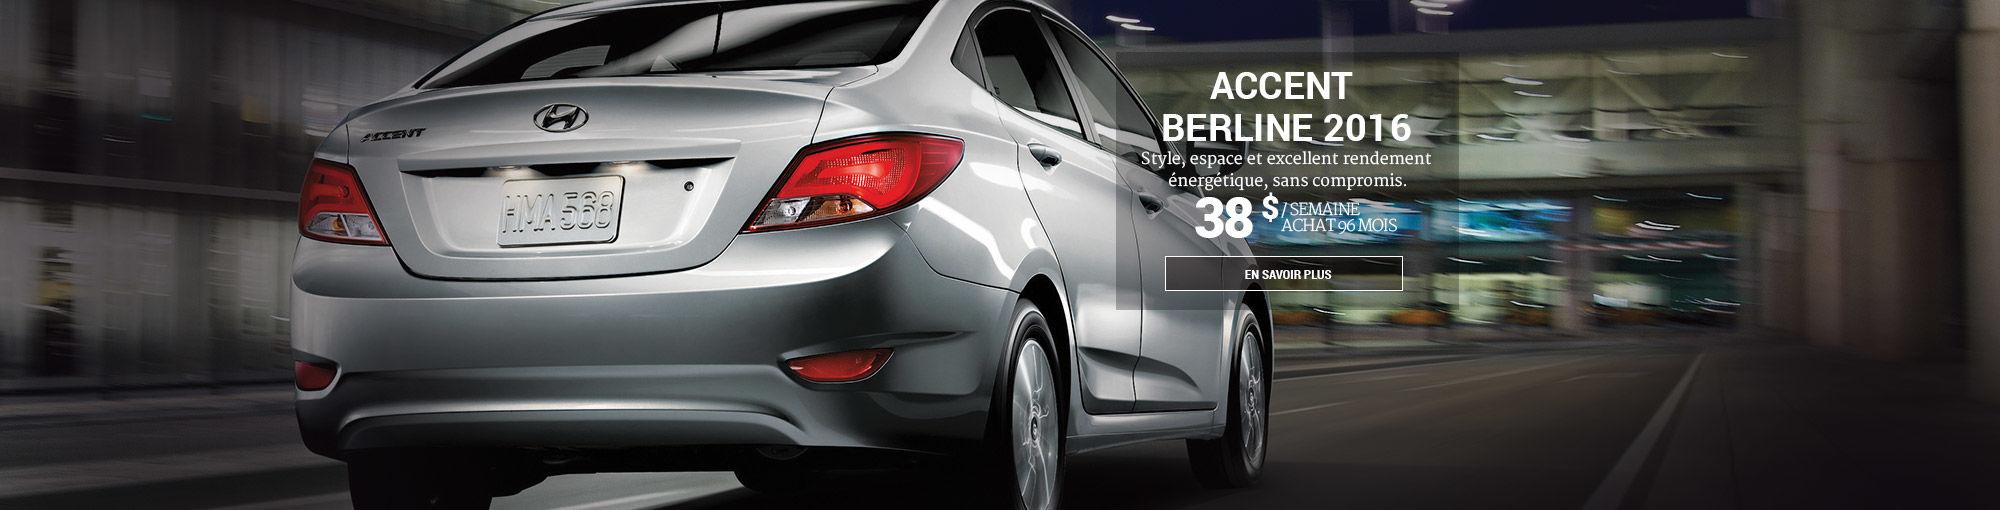 Hyundai Accent 2016 - header - août 2016 - HTR